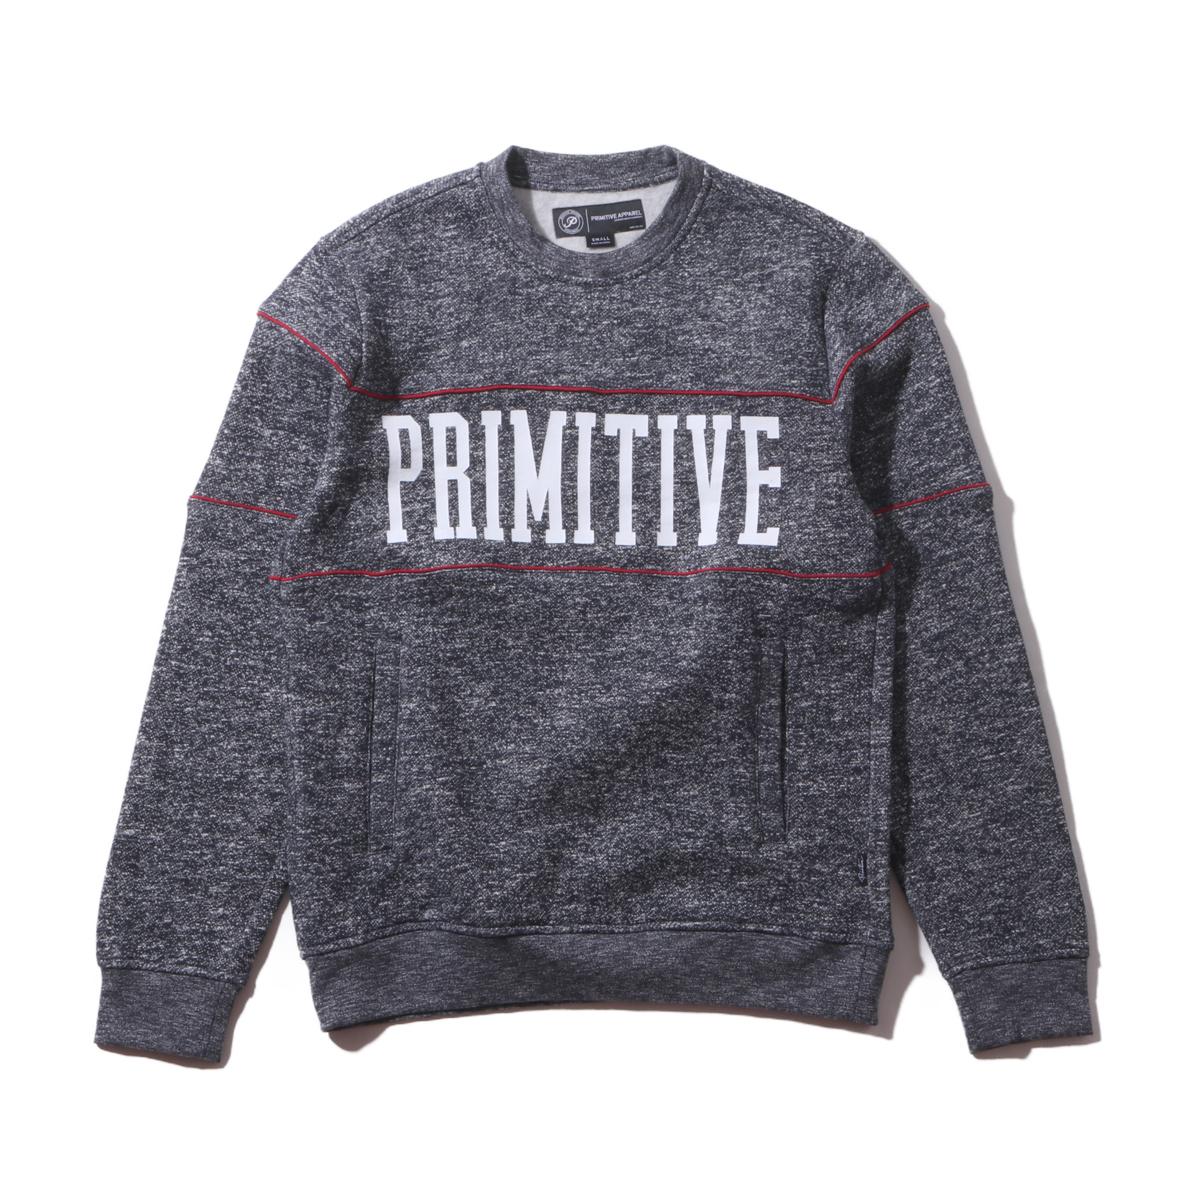 Primitive PIPED CREW (NAVY) 【トレーナー】【16FA-I】